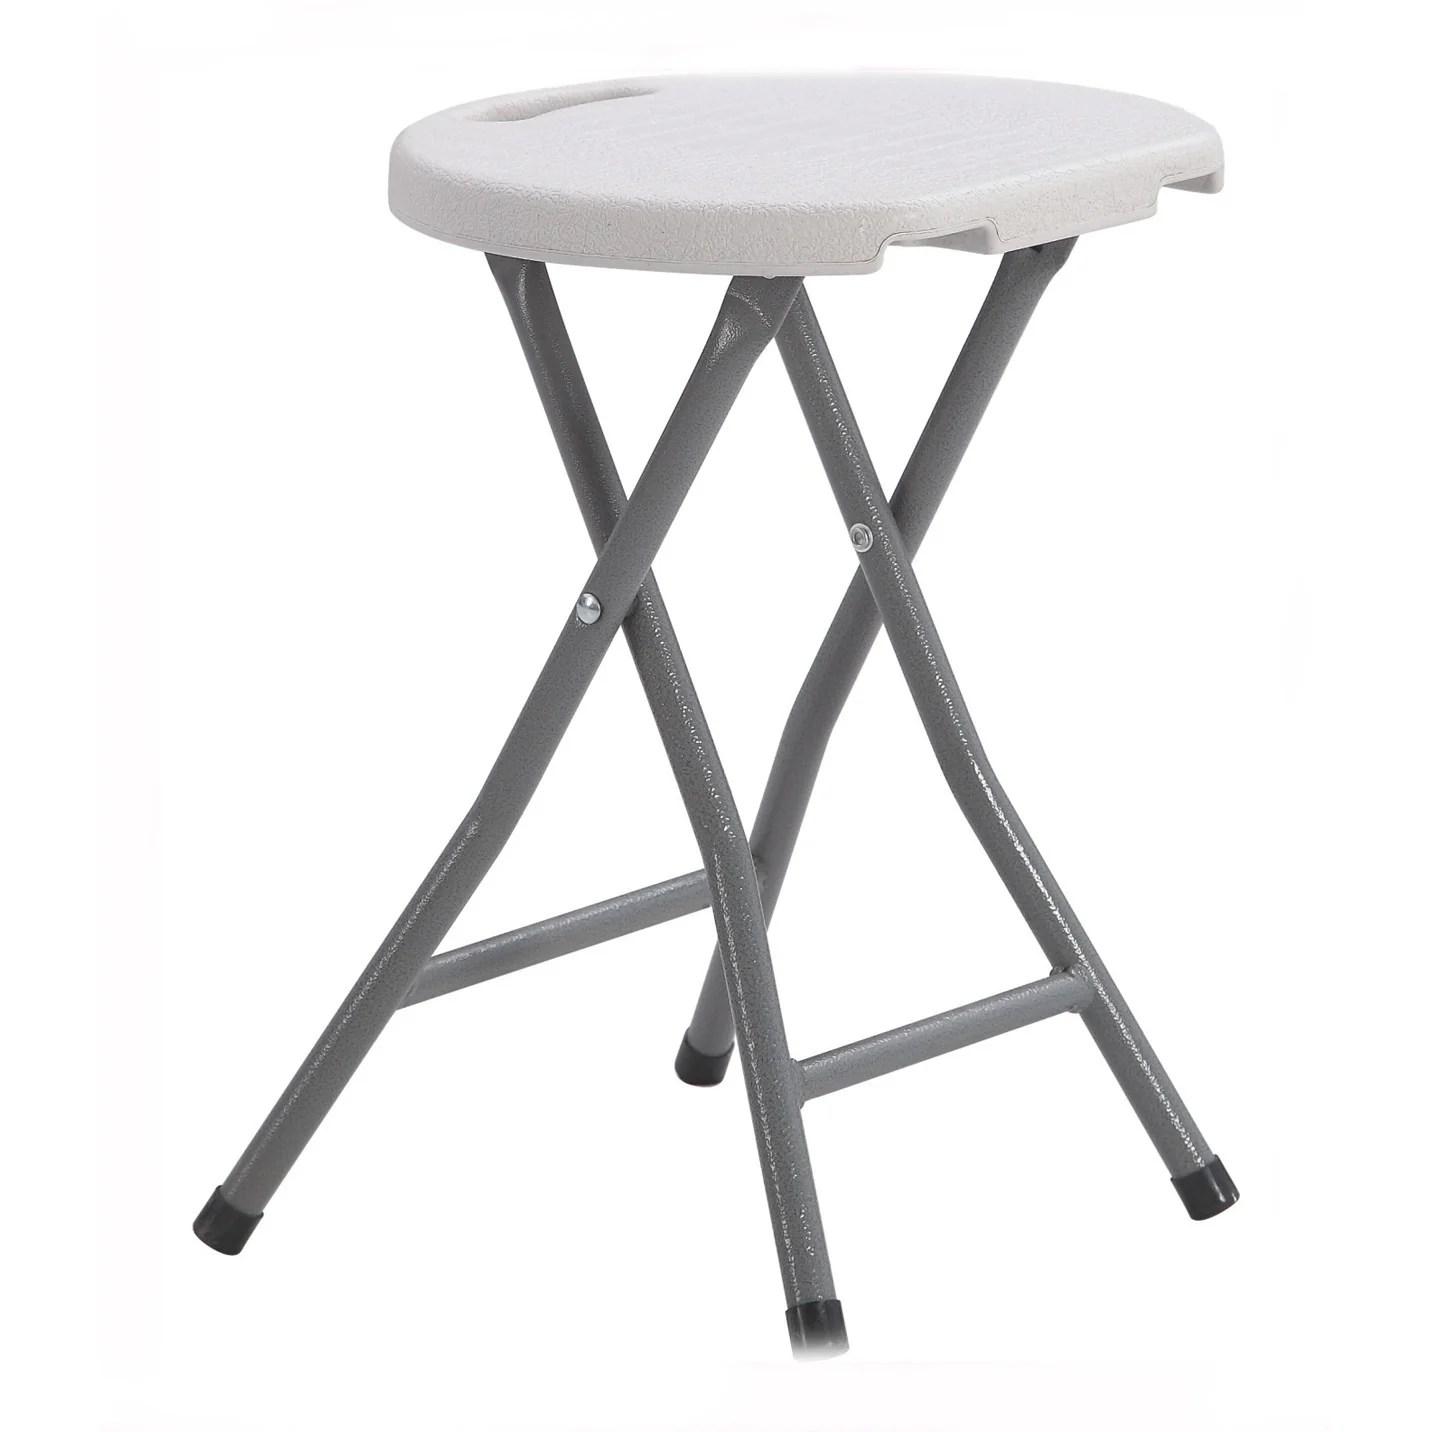 plastic stool chair malaysia avengers bean bag d96 hdpe folding suchprice